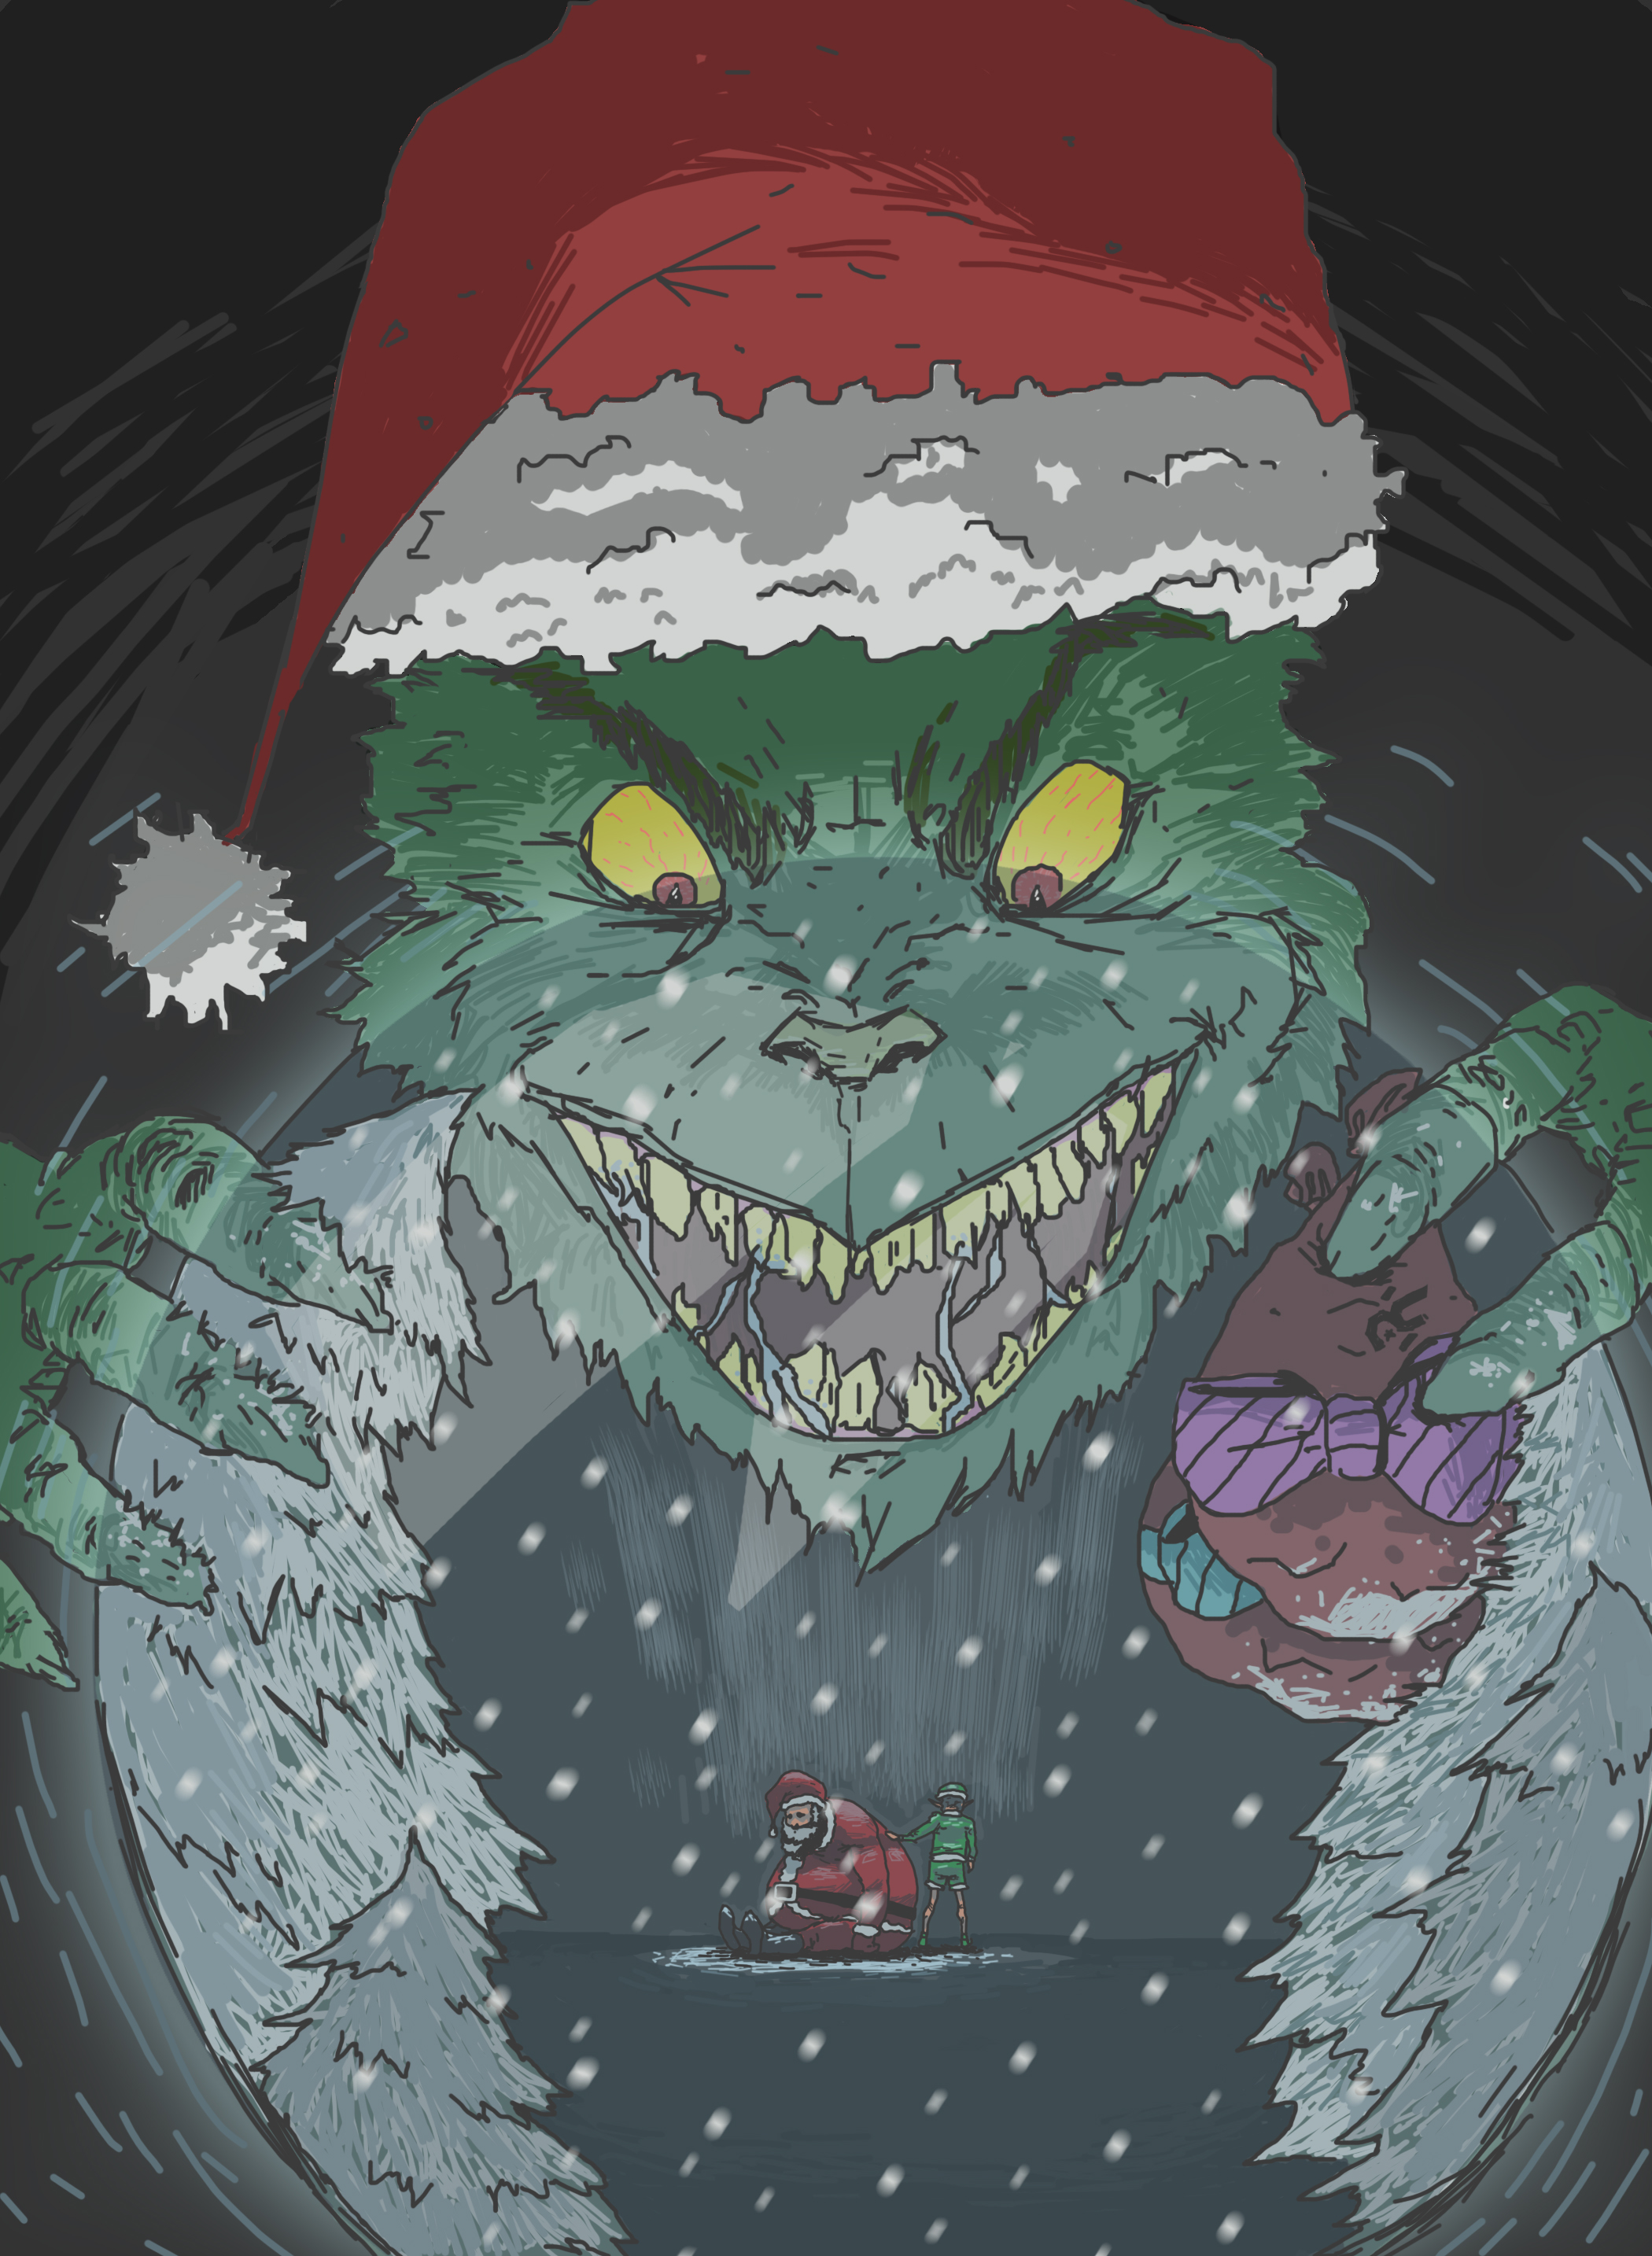 The Grinch:BYE BYE CHRISTMAS